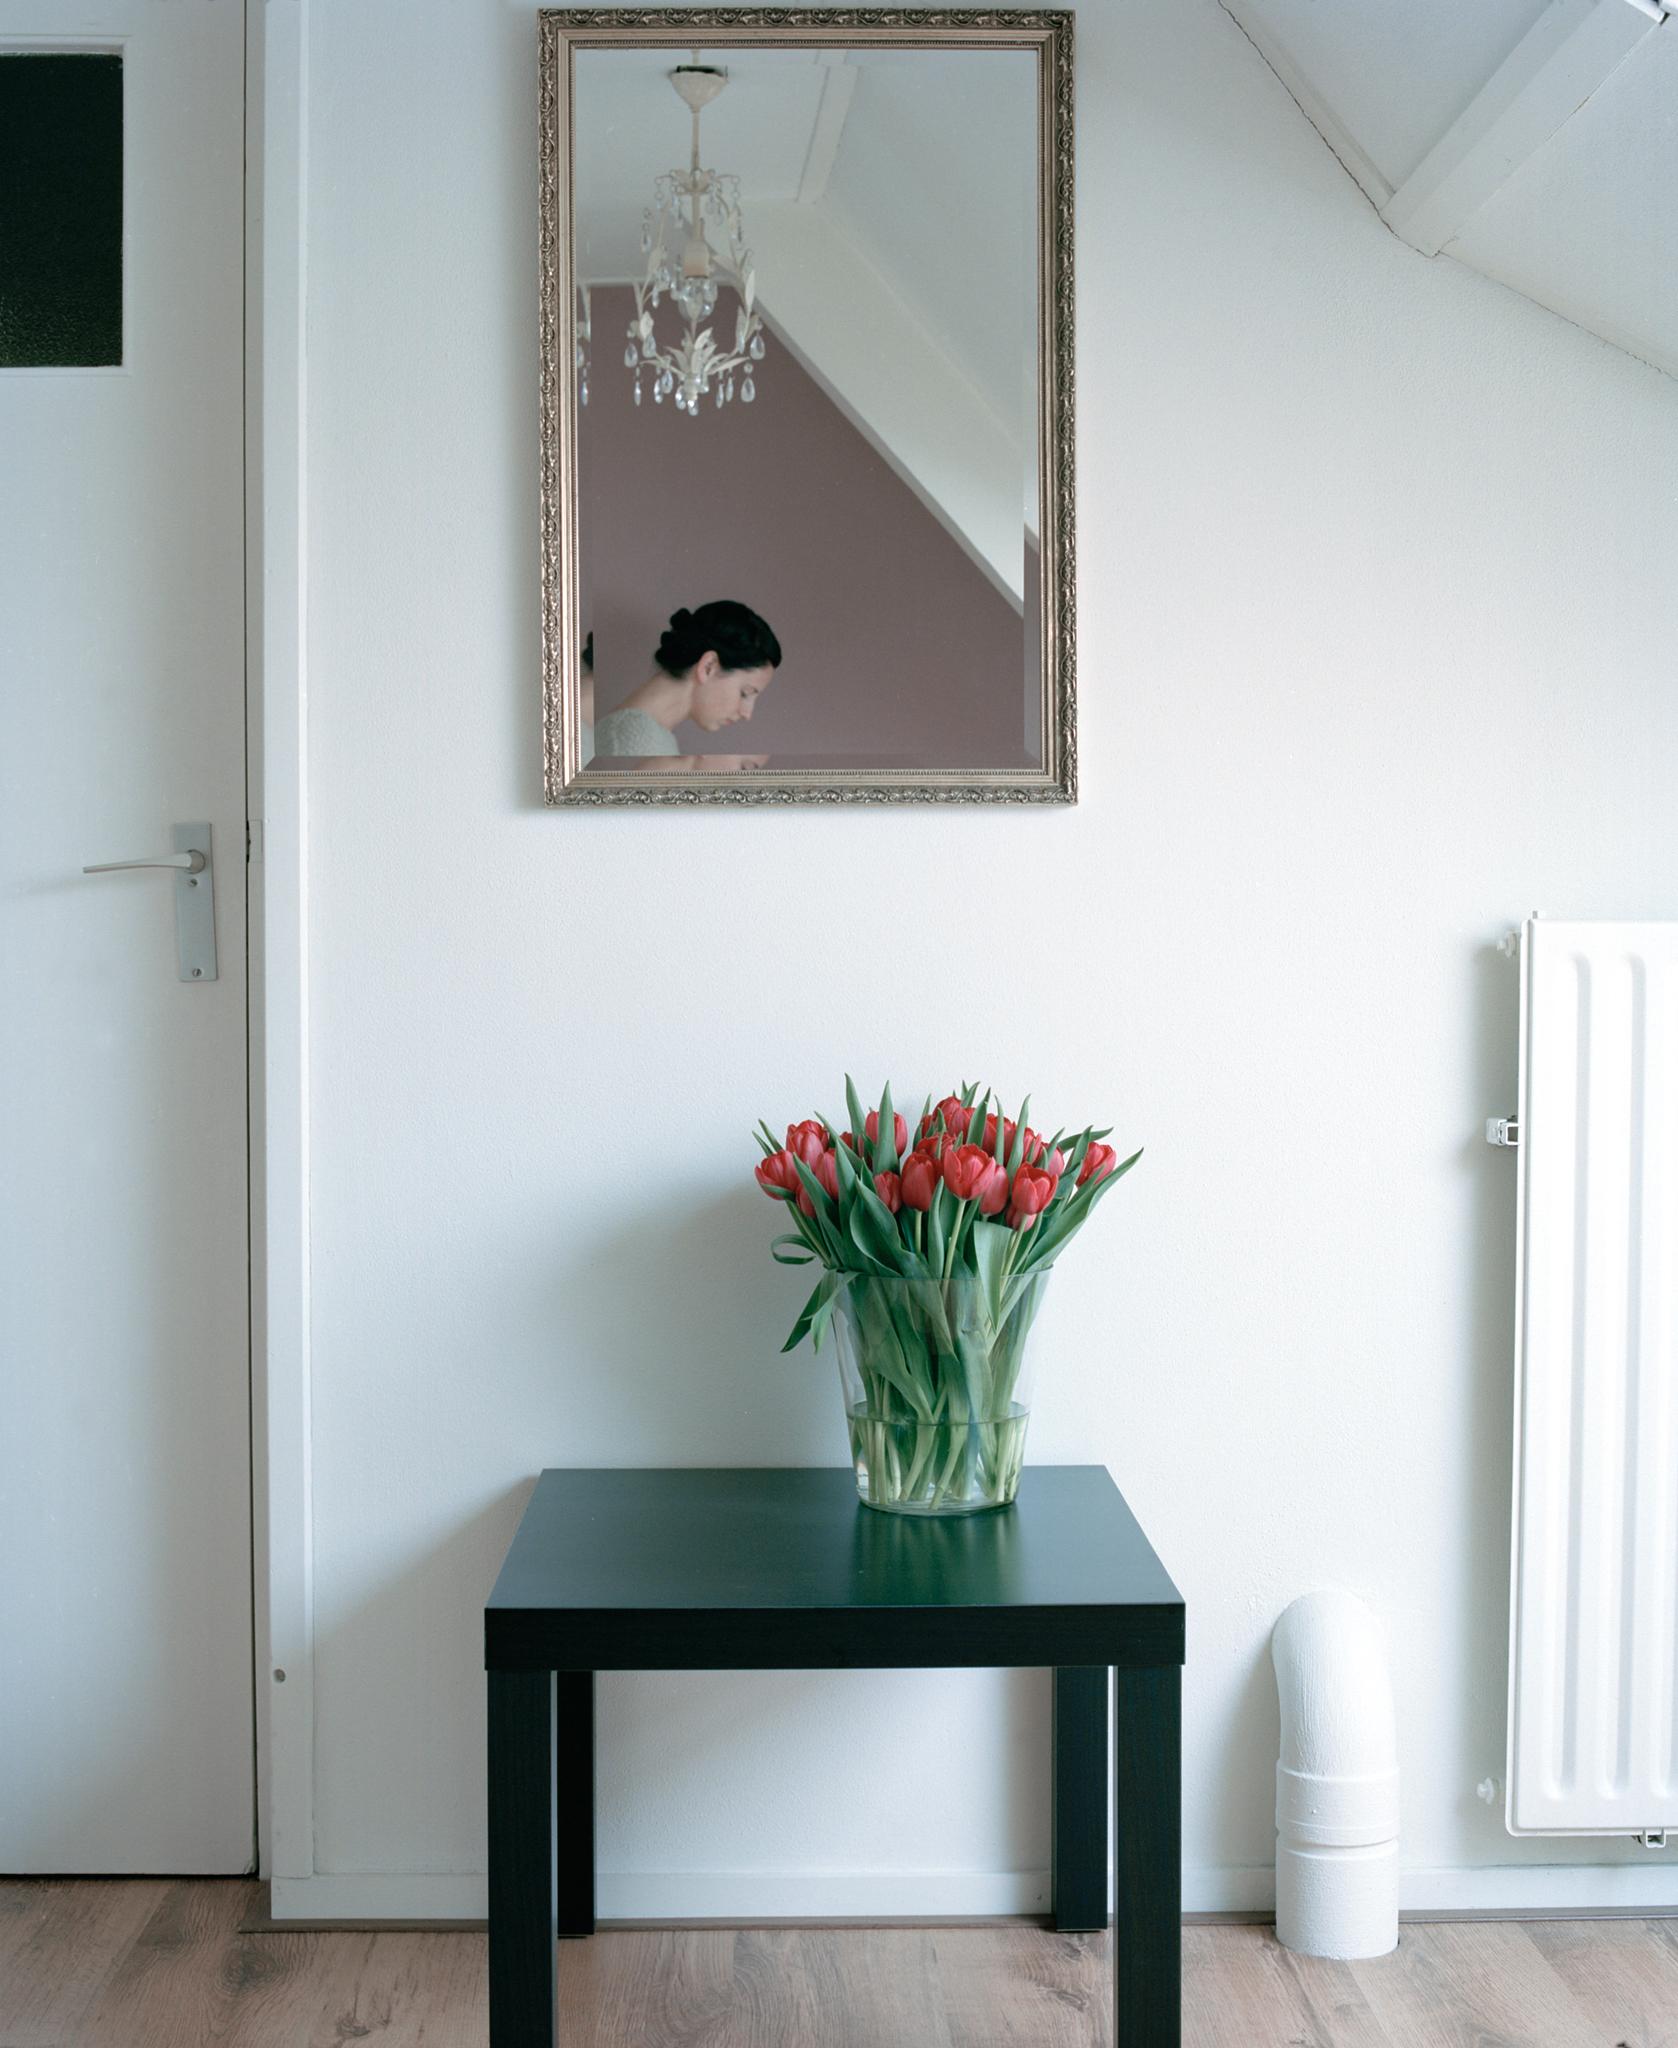 Salon | 2012